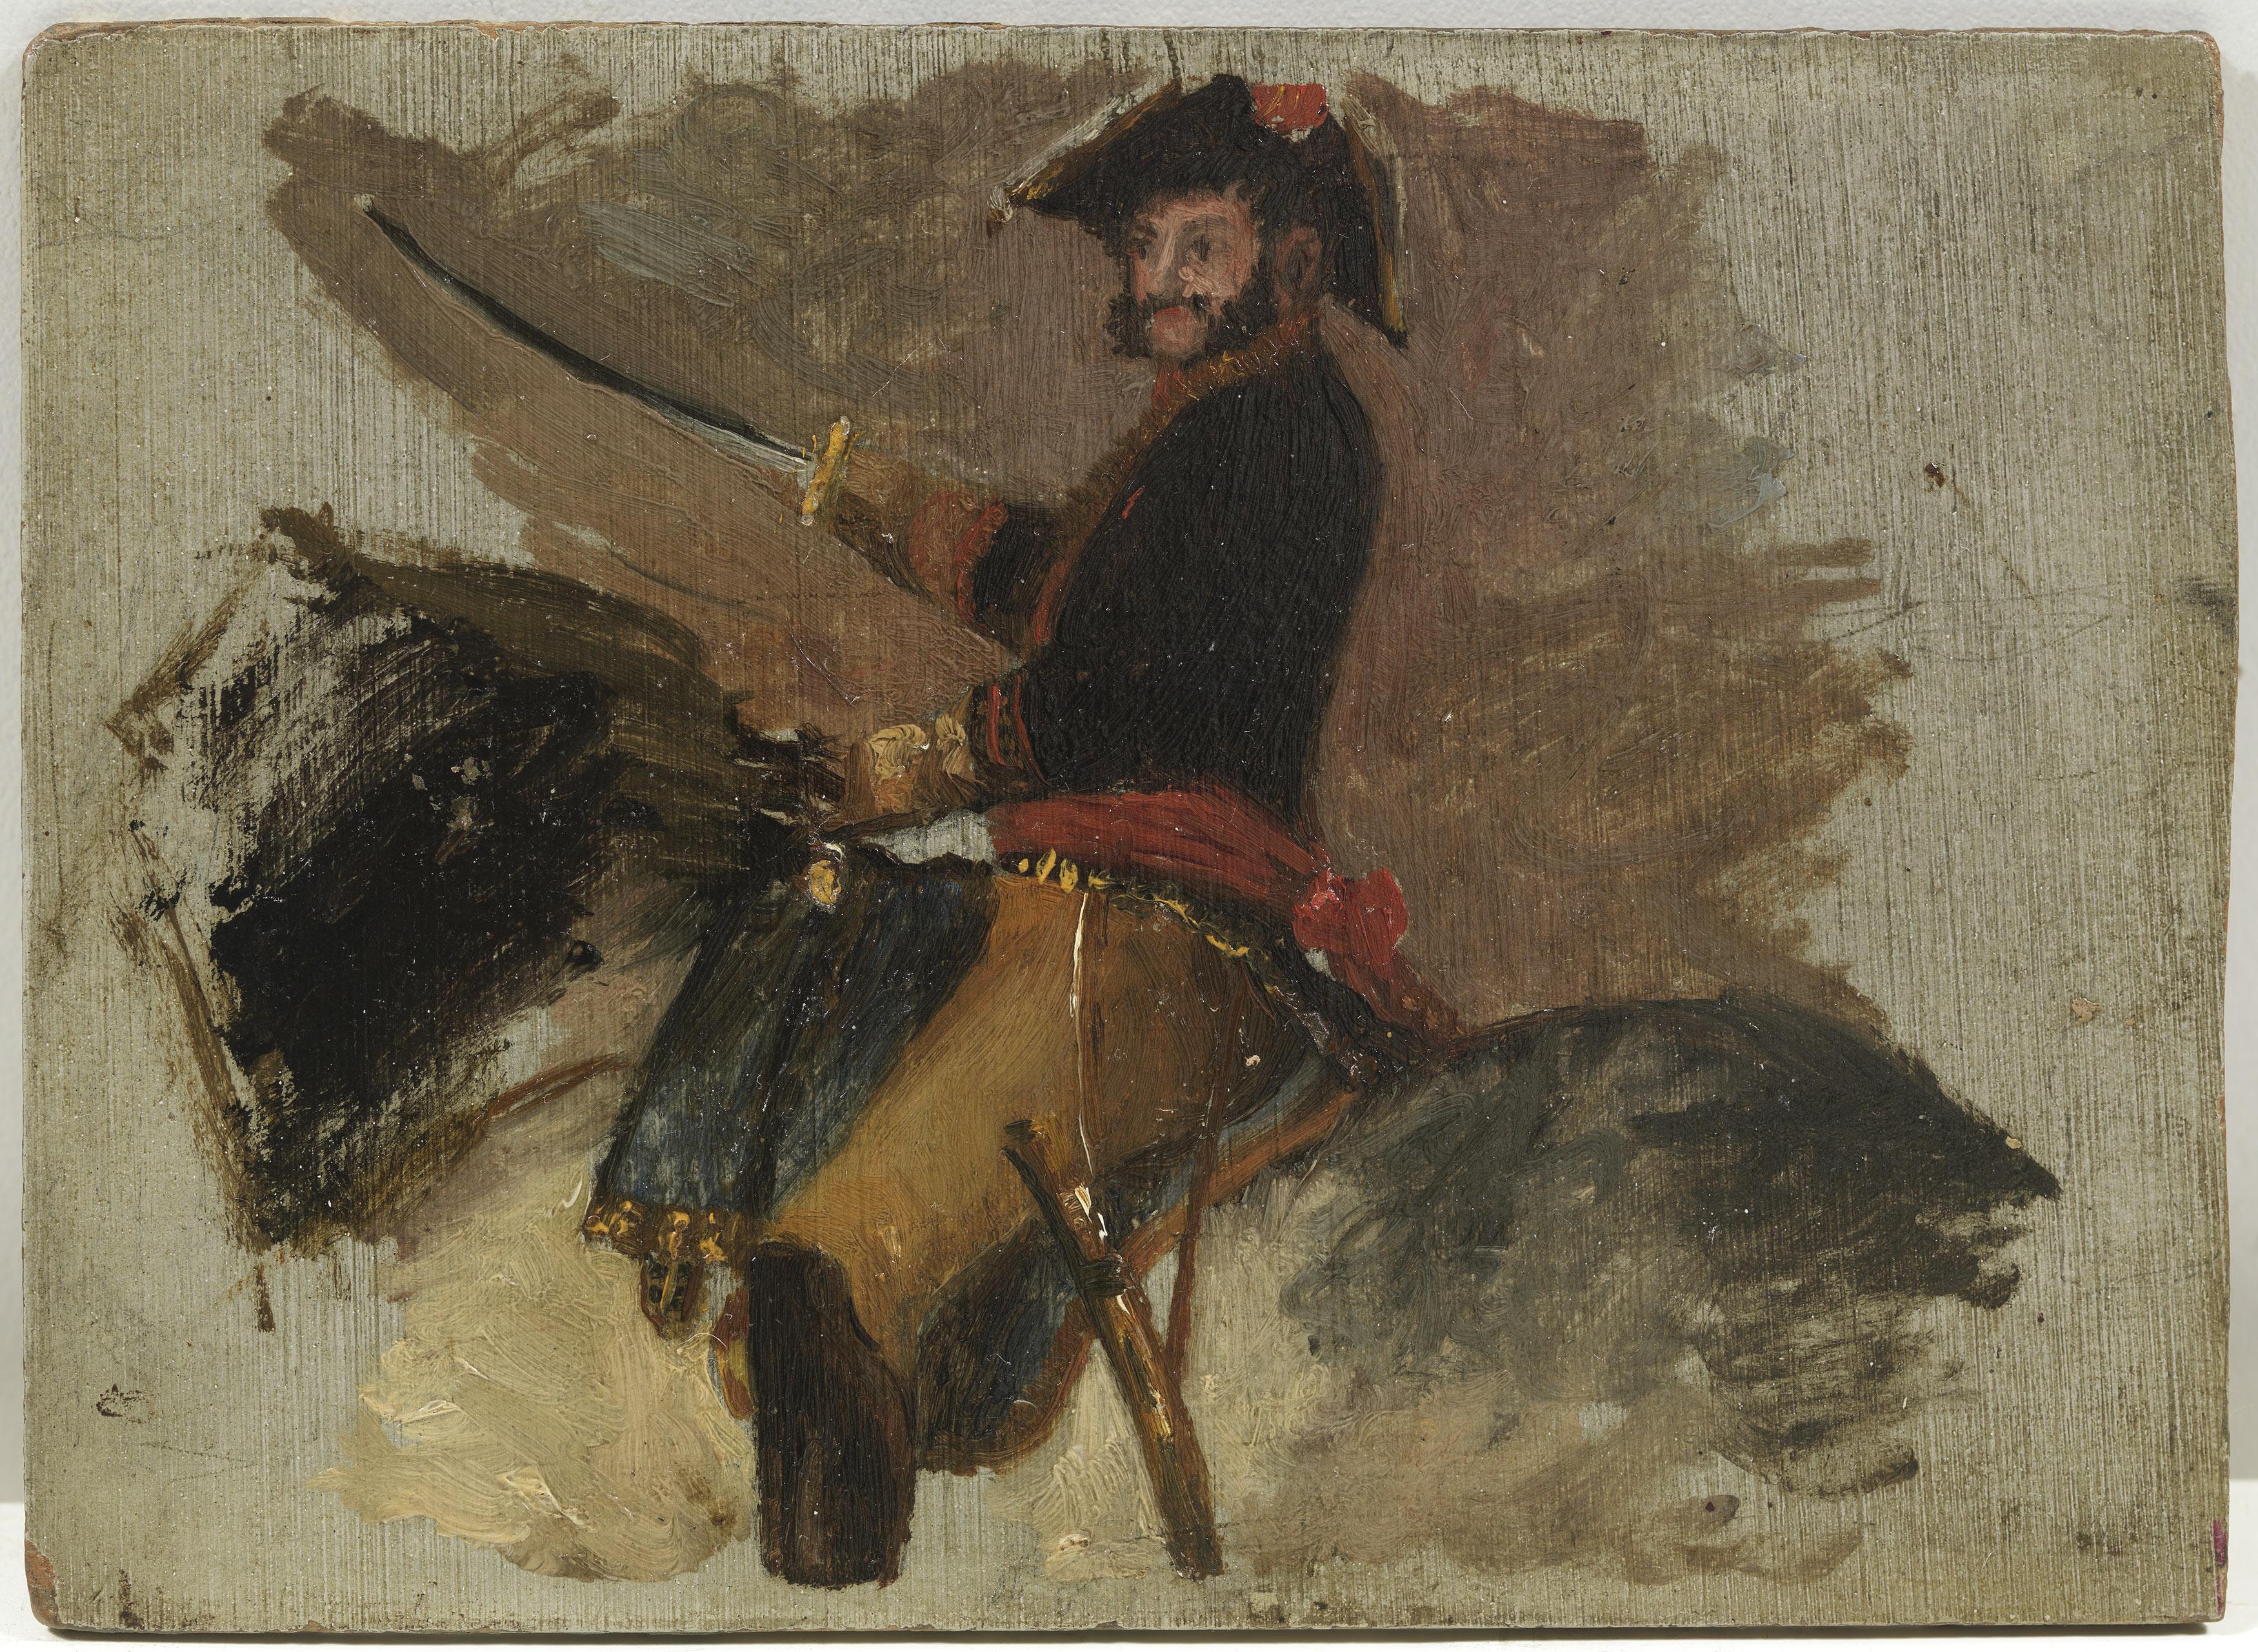 Pablo Picasso – General Palafox